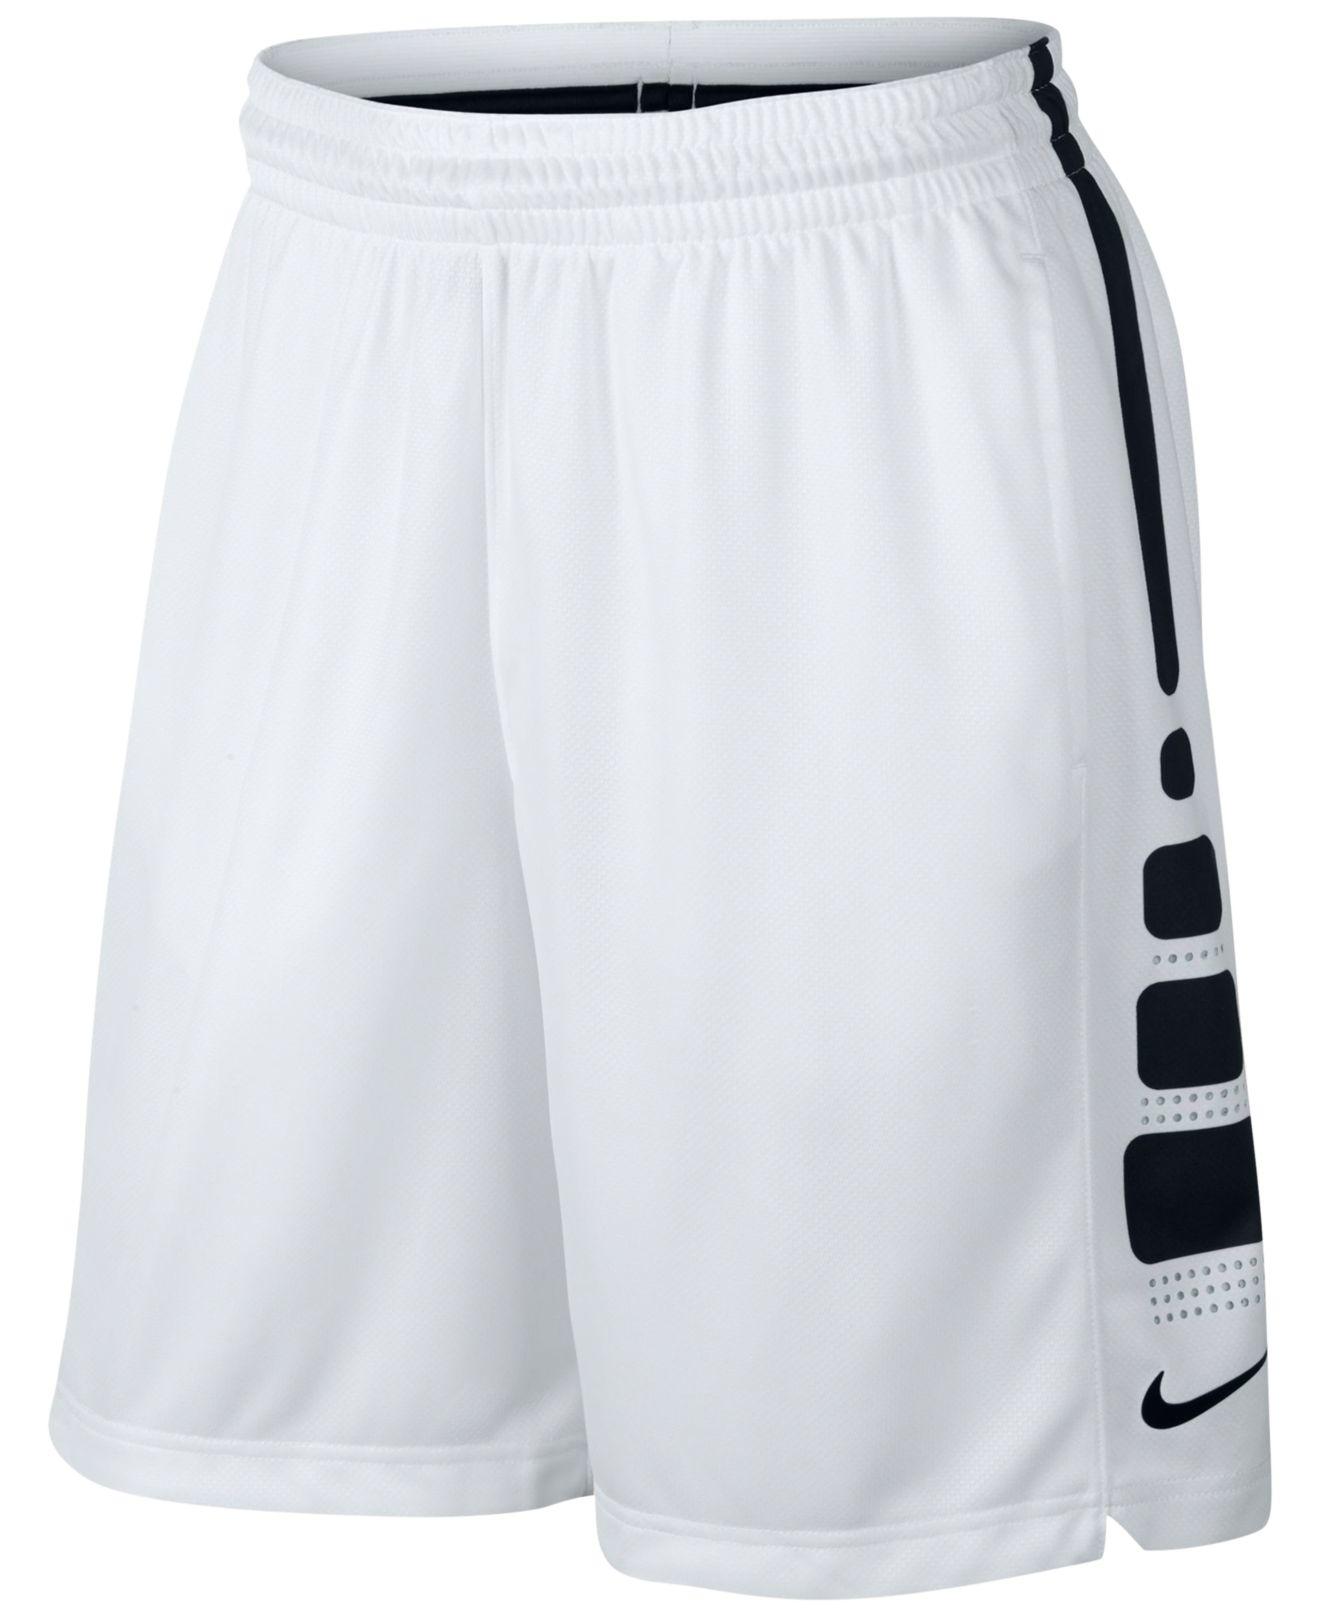 2061e772 Nike Elite Dri-fit Basketball Shorts in Black for Men - Lyst